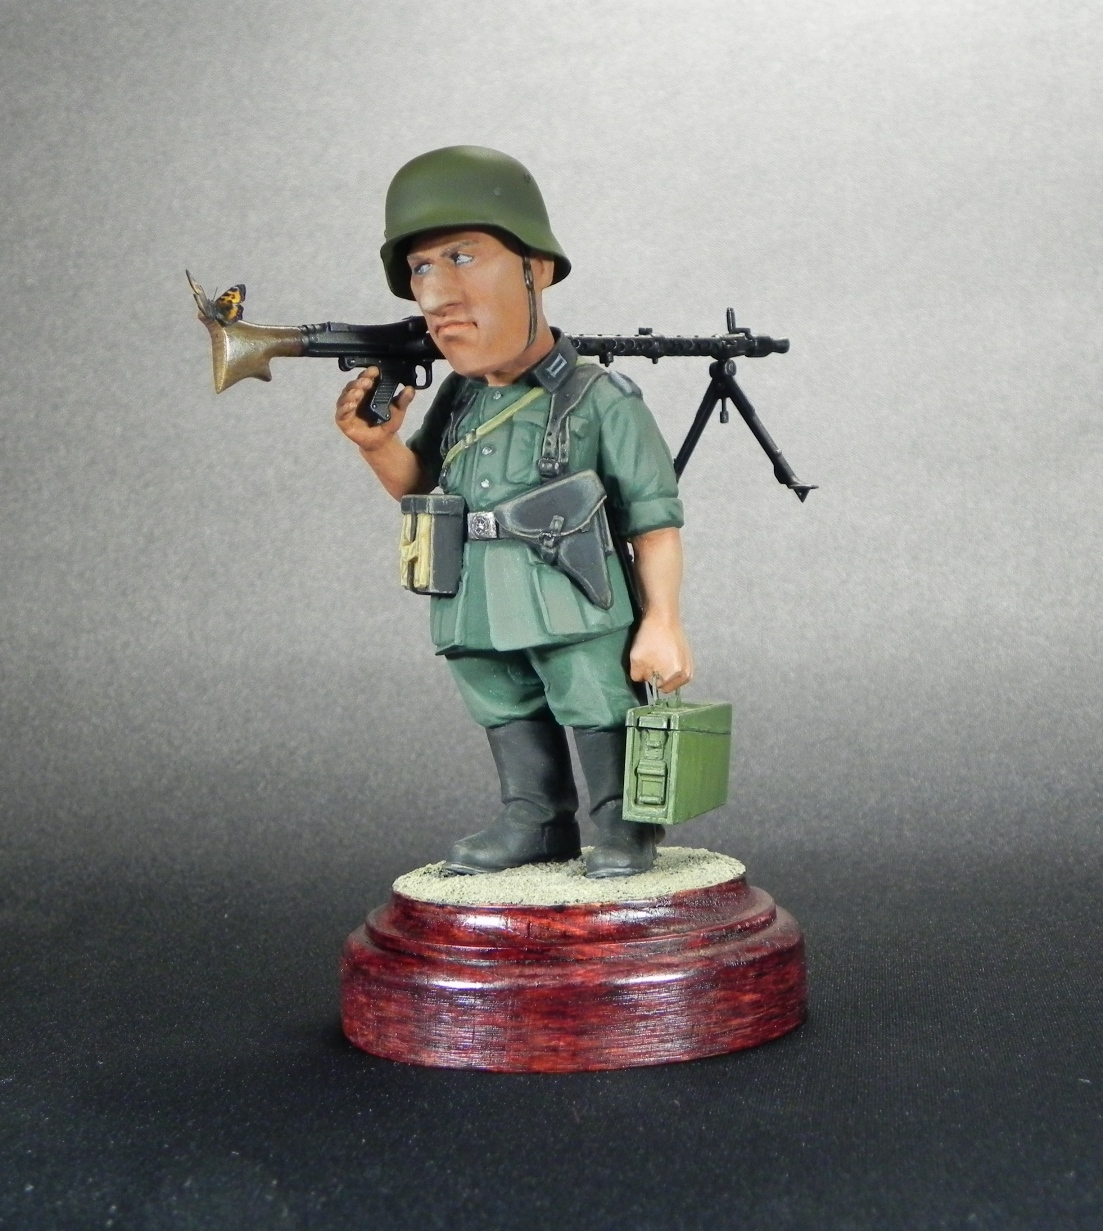 Miscellaneous: Machine gunner Meyer, photo #6